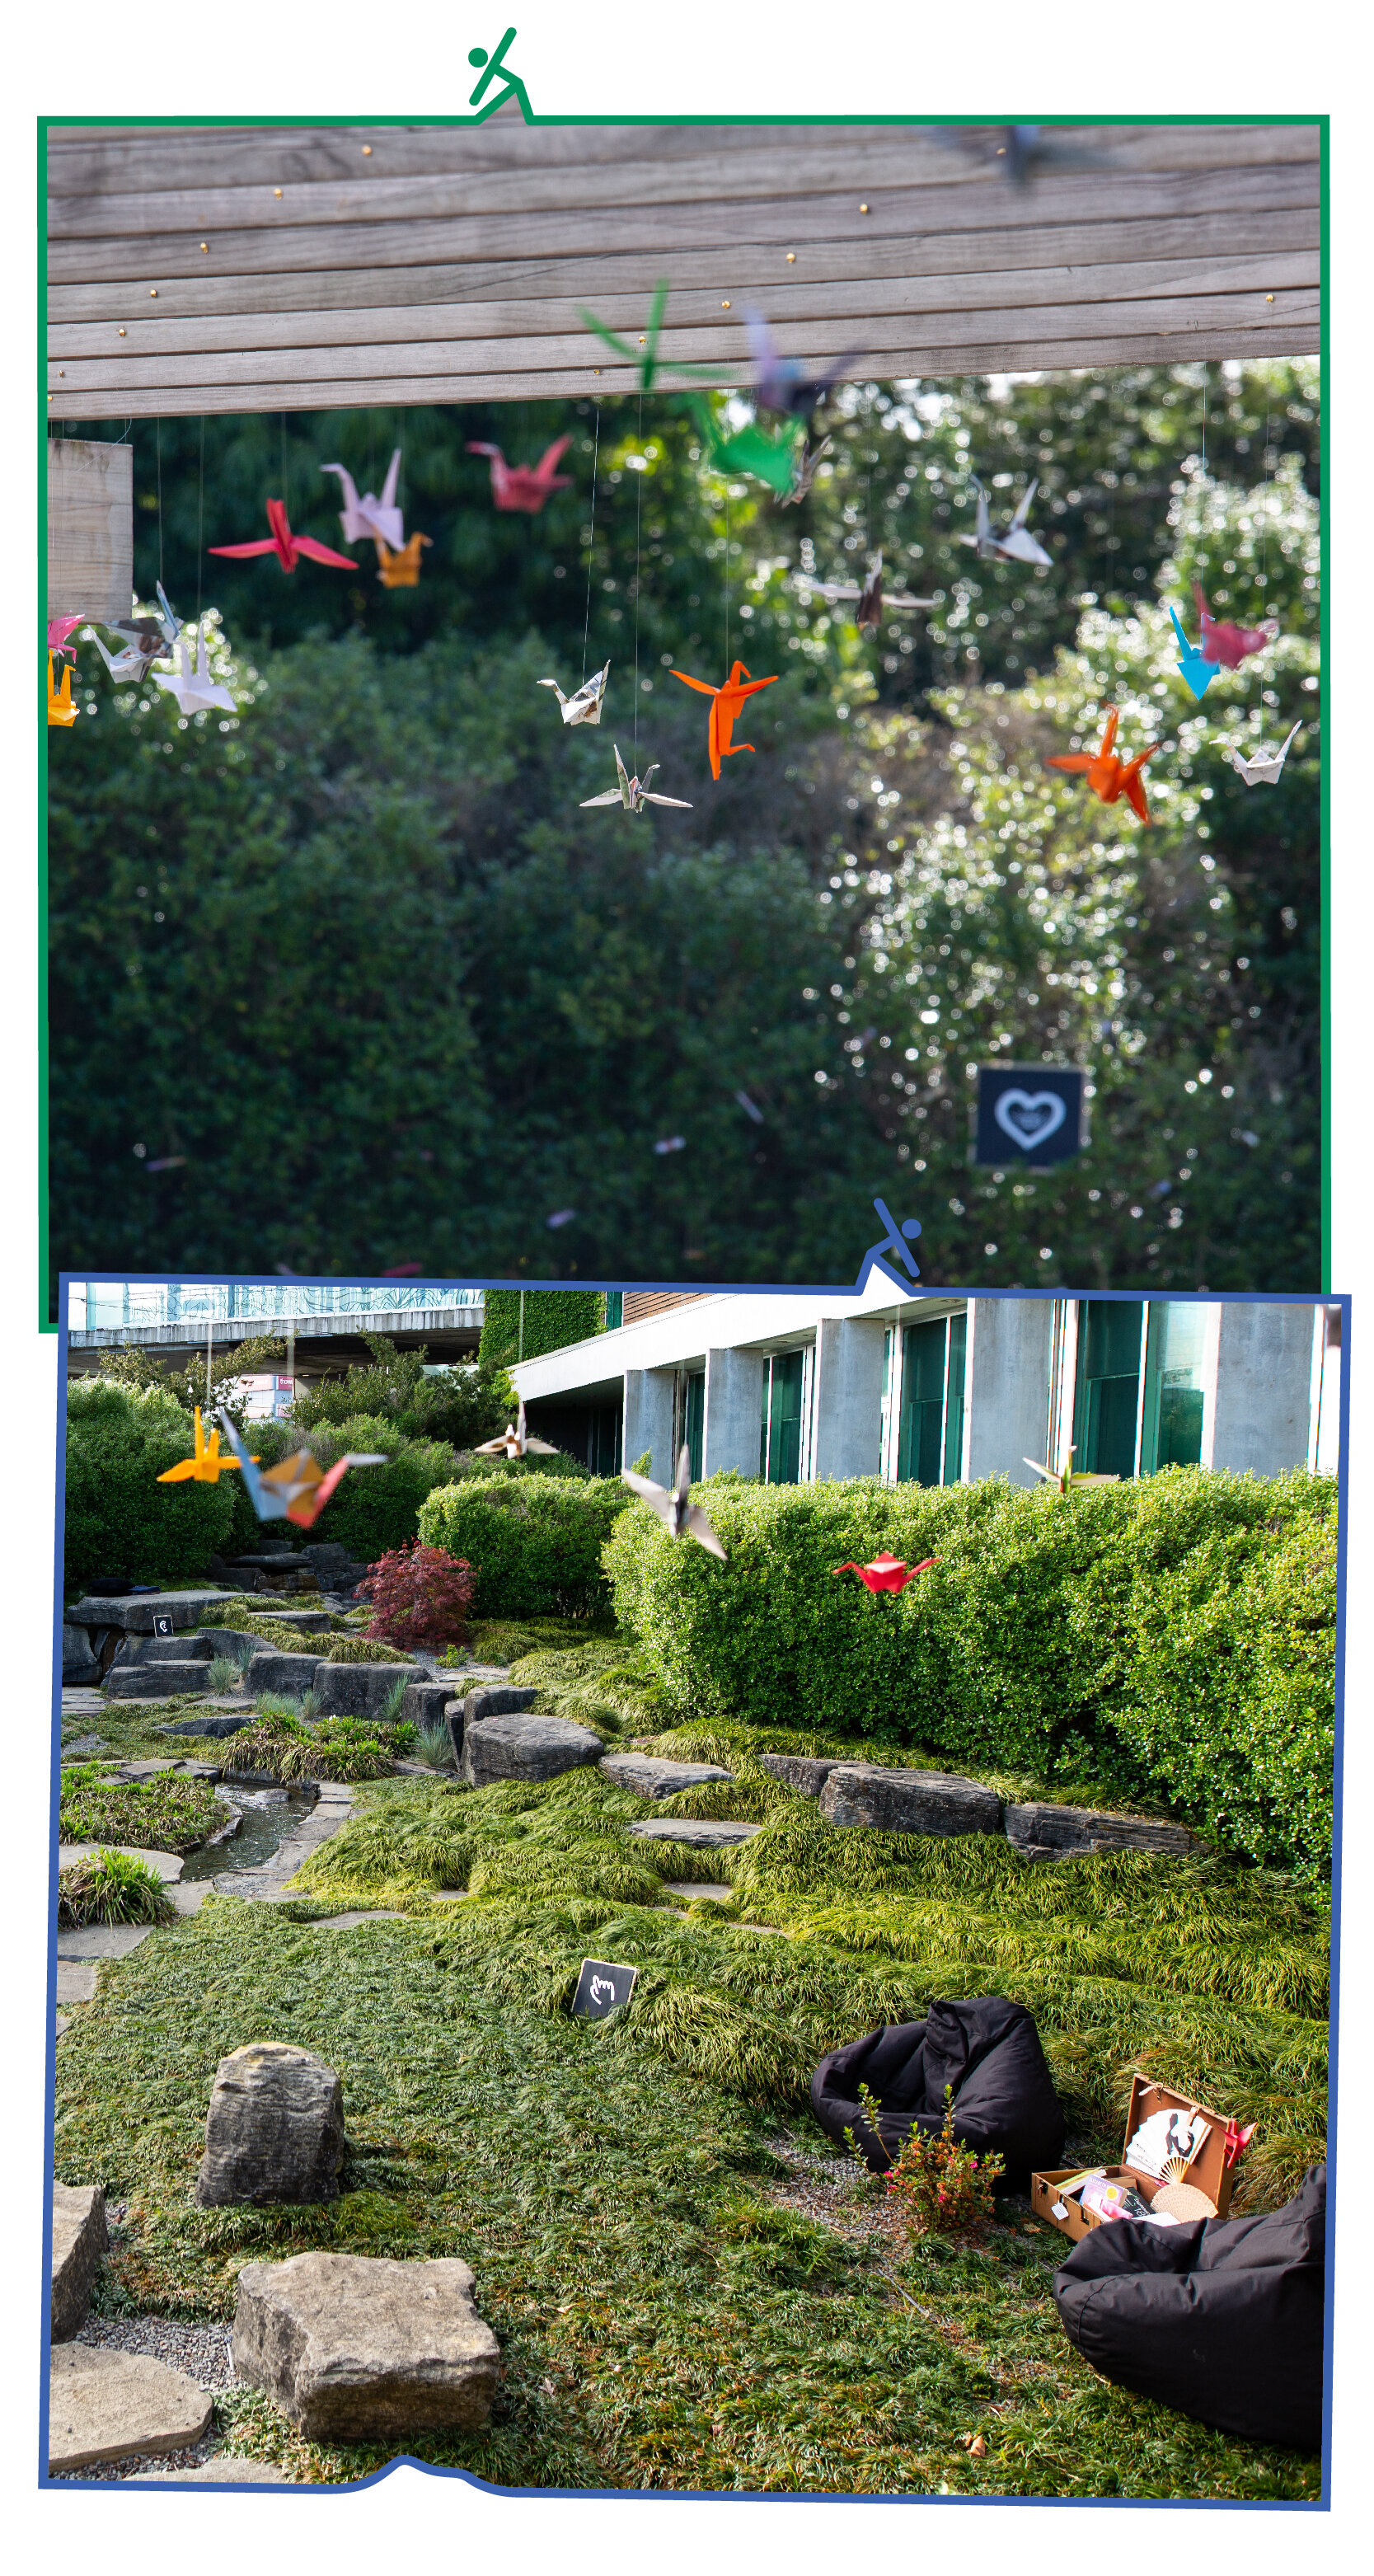 TMPW_CaseStudy_Japanese Garden-11.jpg